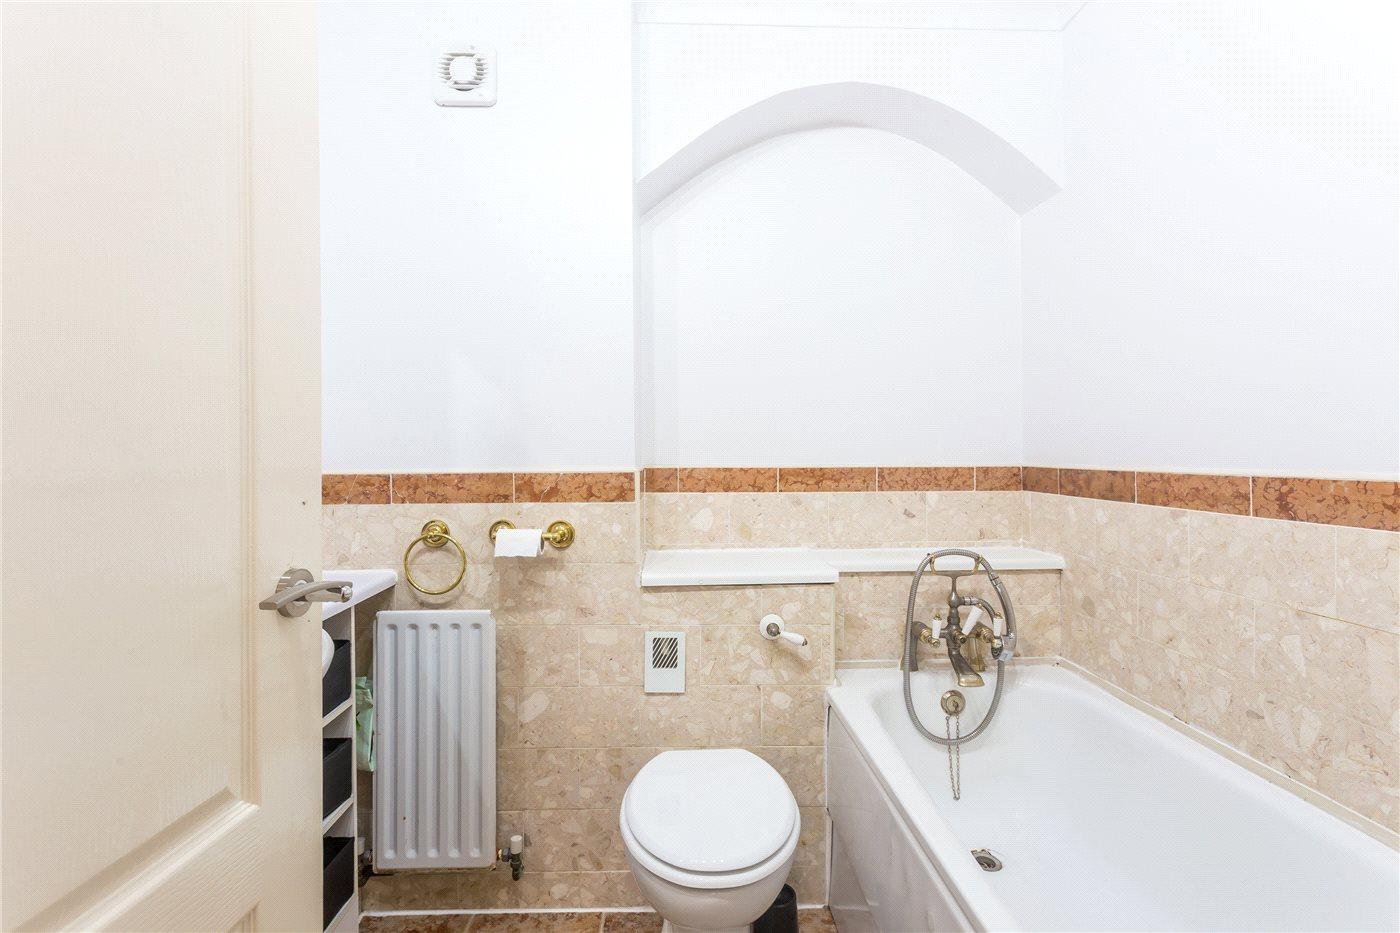 2 Bedroom Flat For Sale Kings Chase View The Ridgeway Enfield En En2 8lg